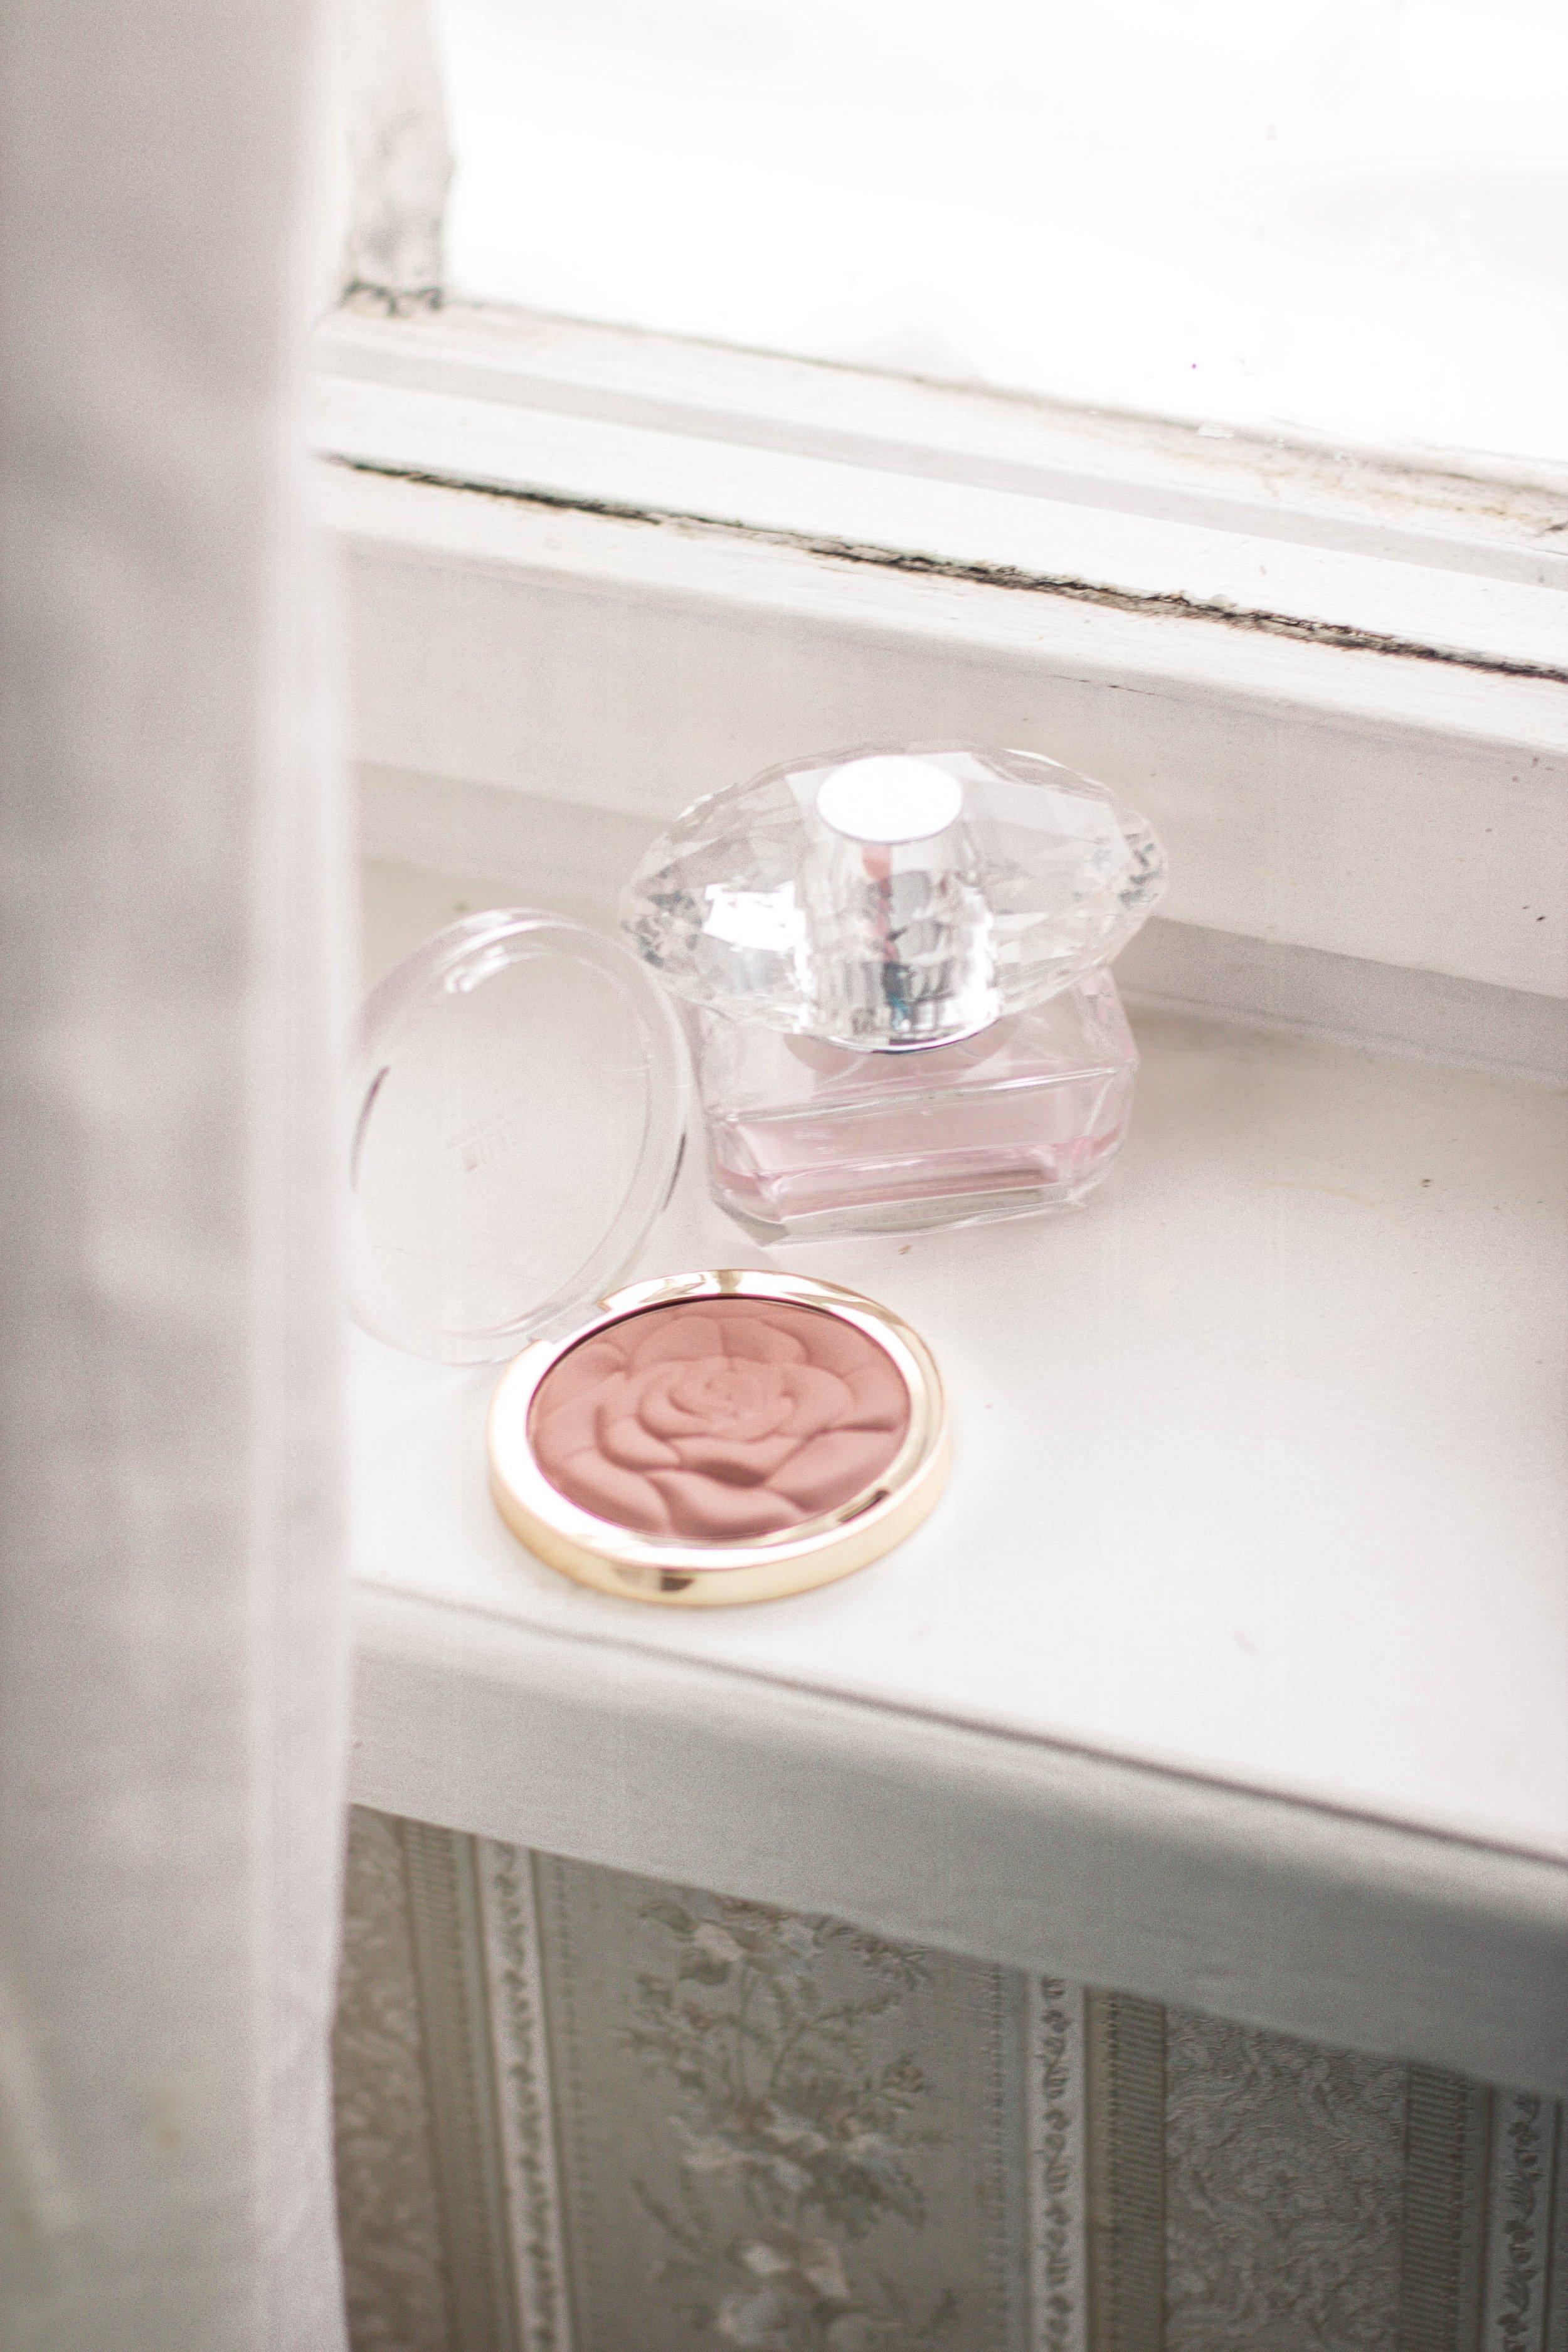 bathroom-blush-container-2417856.jpg